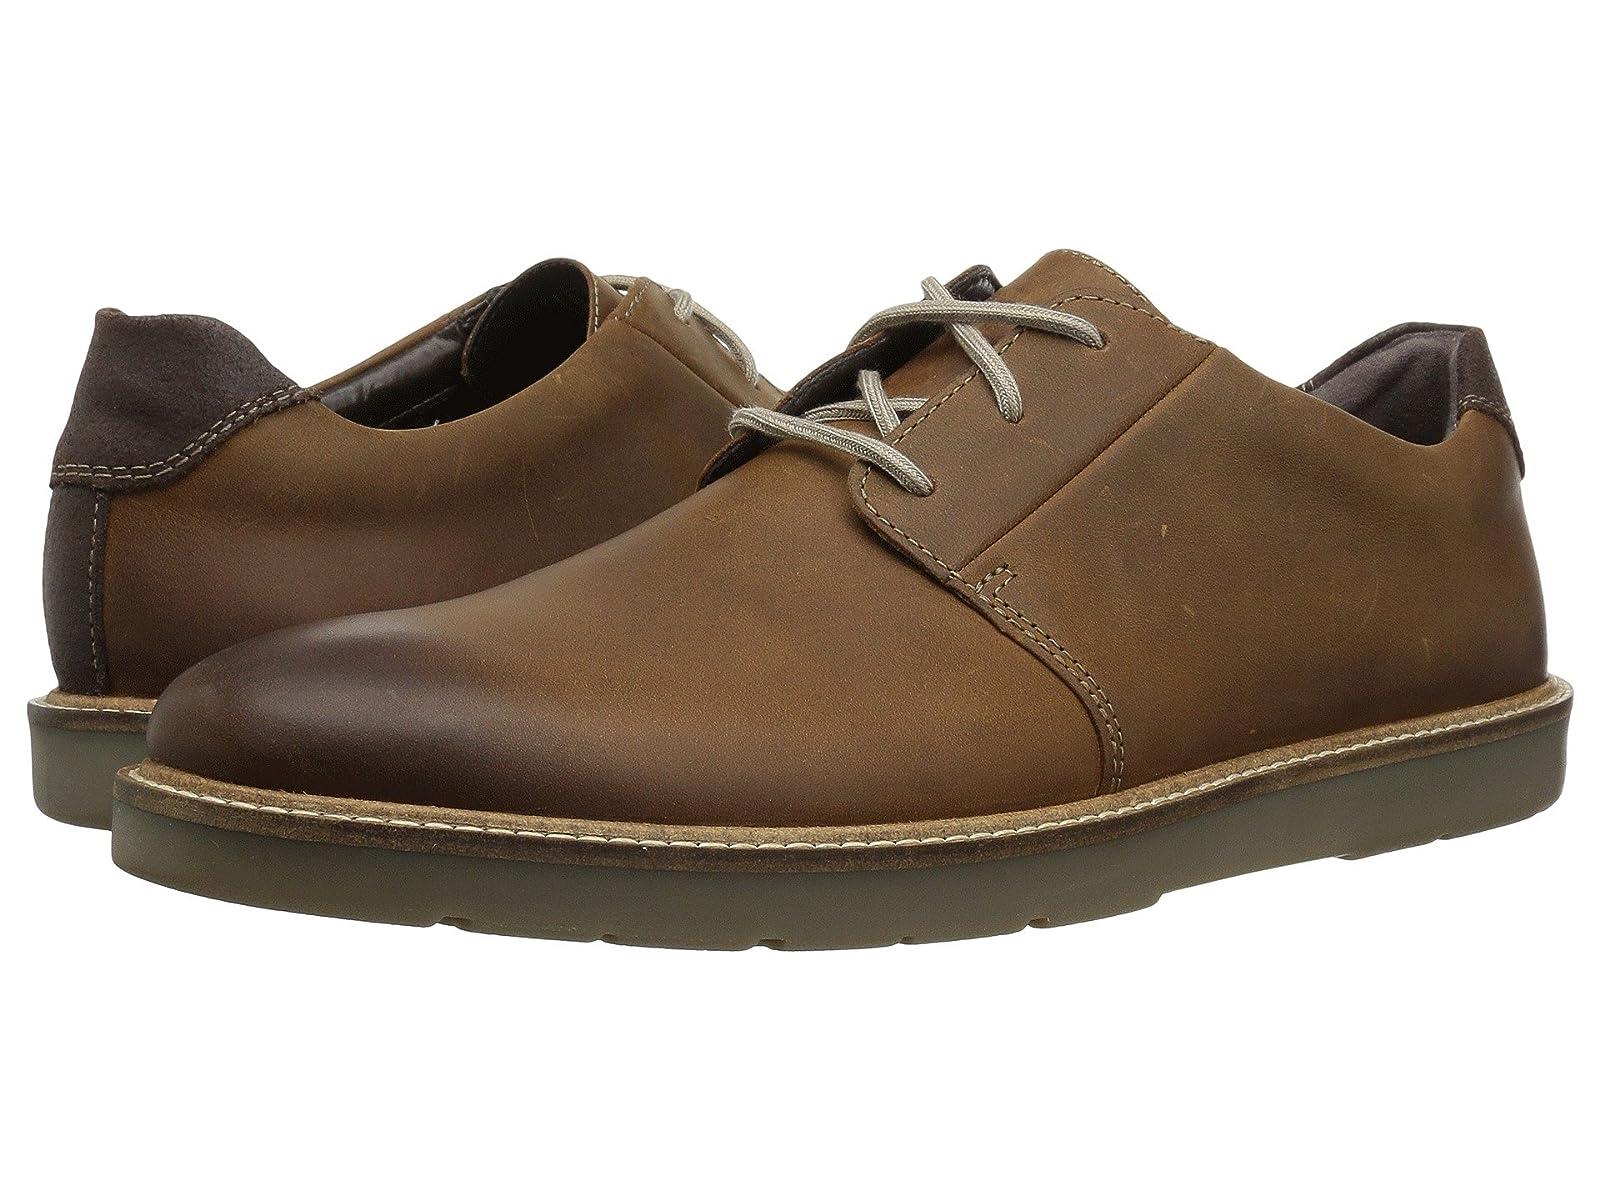 Clarks Grandin PlainCheap and distinctive eye-catching shoes